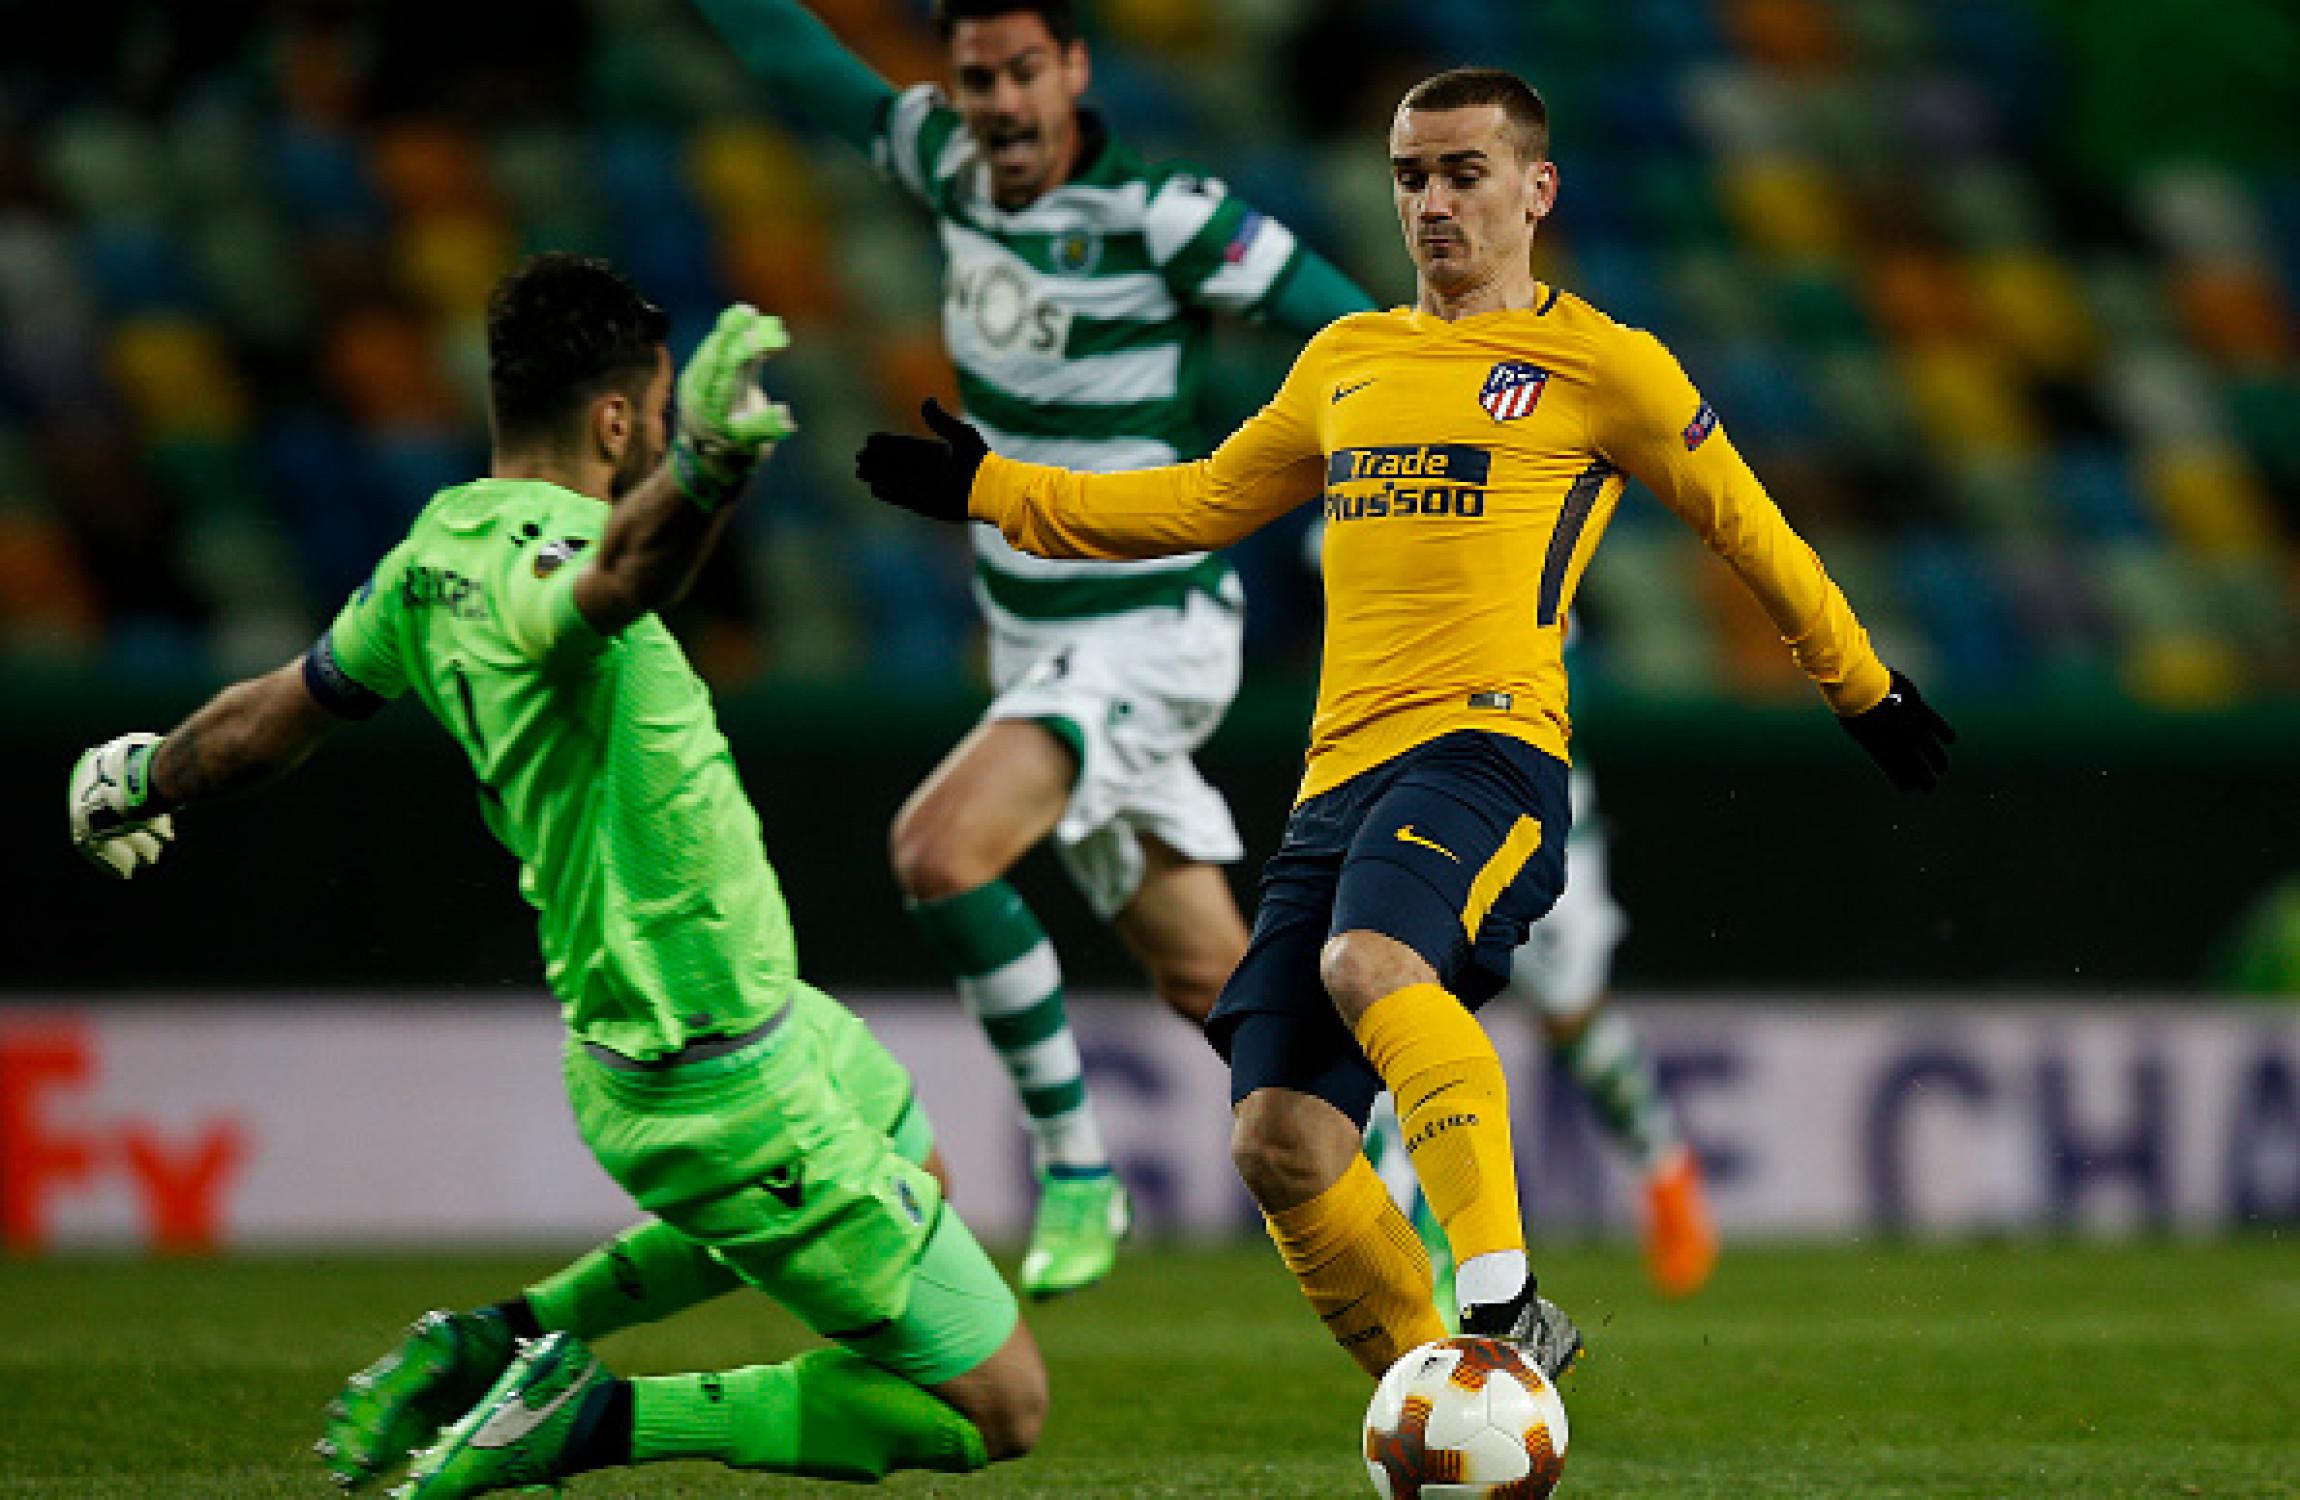 Atletico seals semi-final spot despite defeat